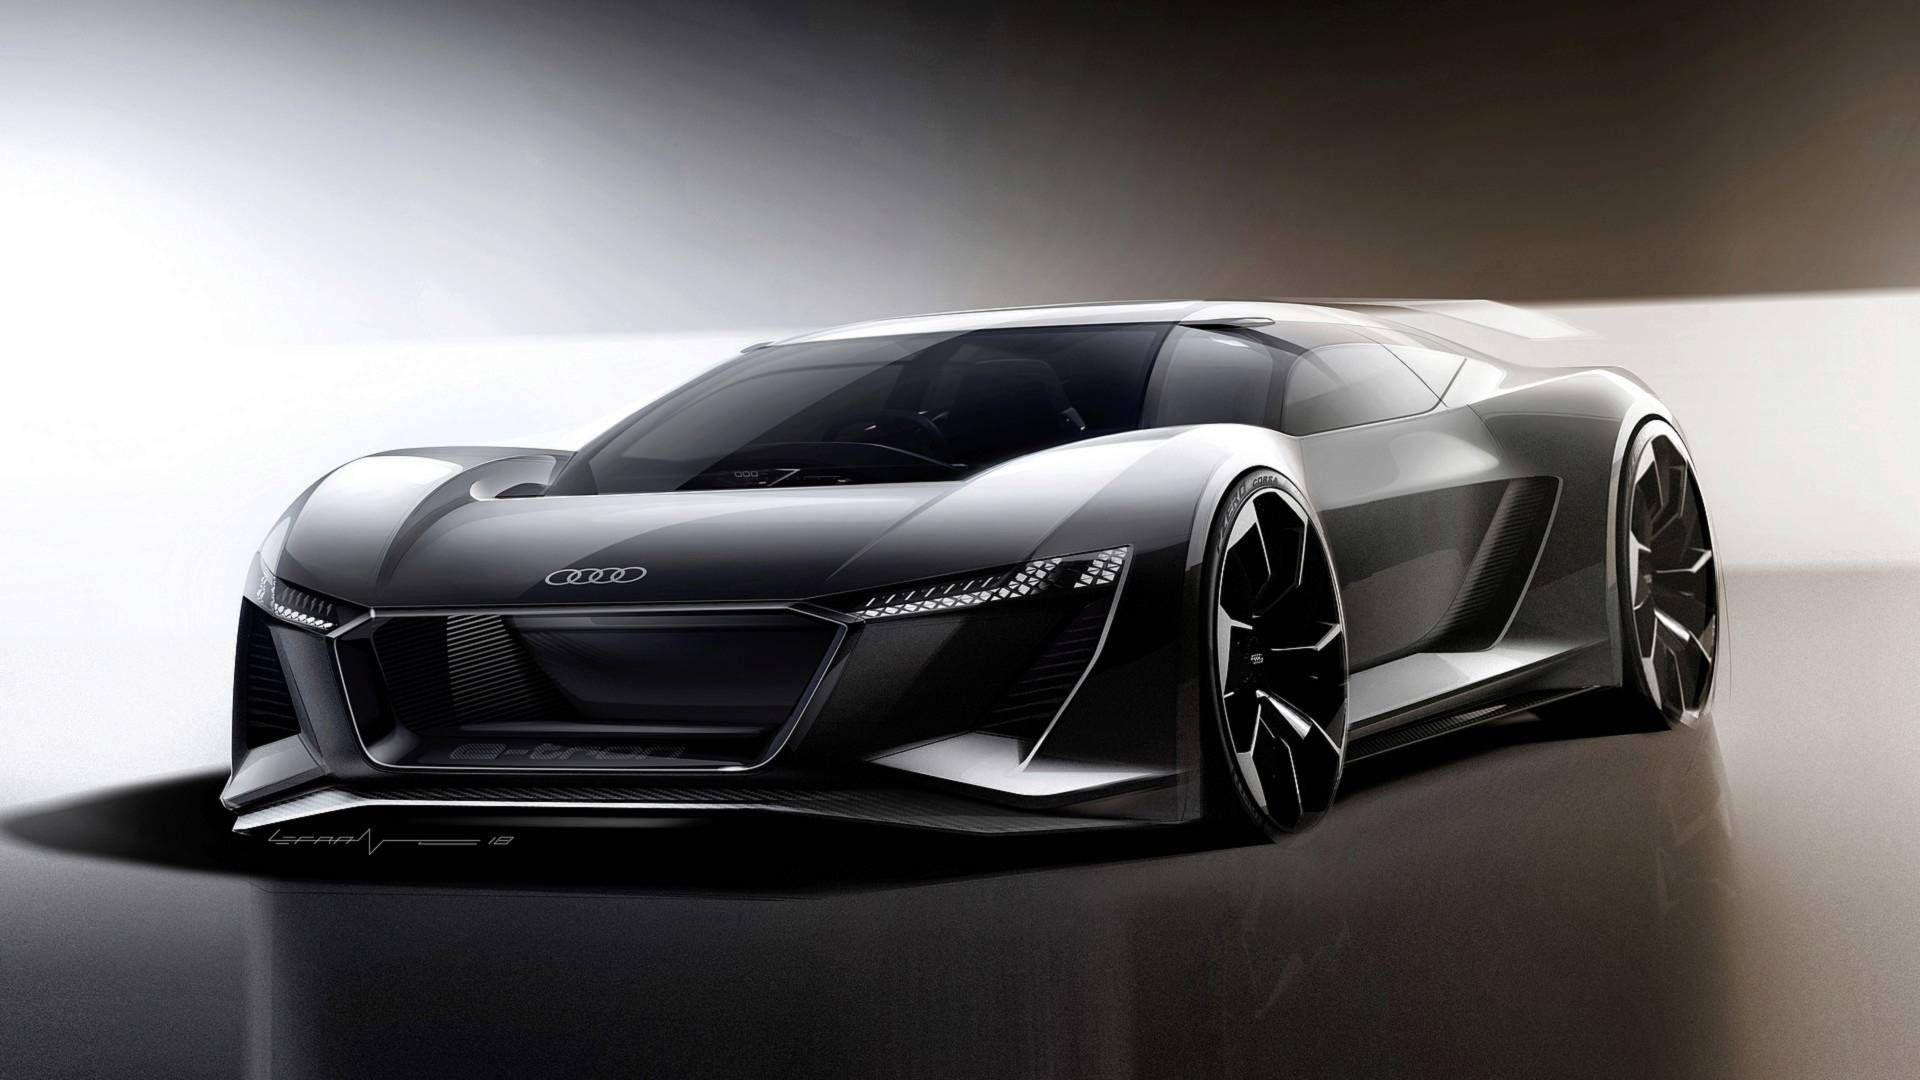 Audi Pb18 E Tron Concept Is A Driver S Car From The Future Carscoops Concept Car Design Audi Audi E Tron